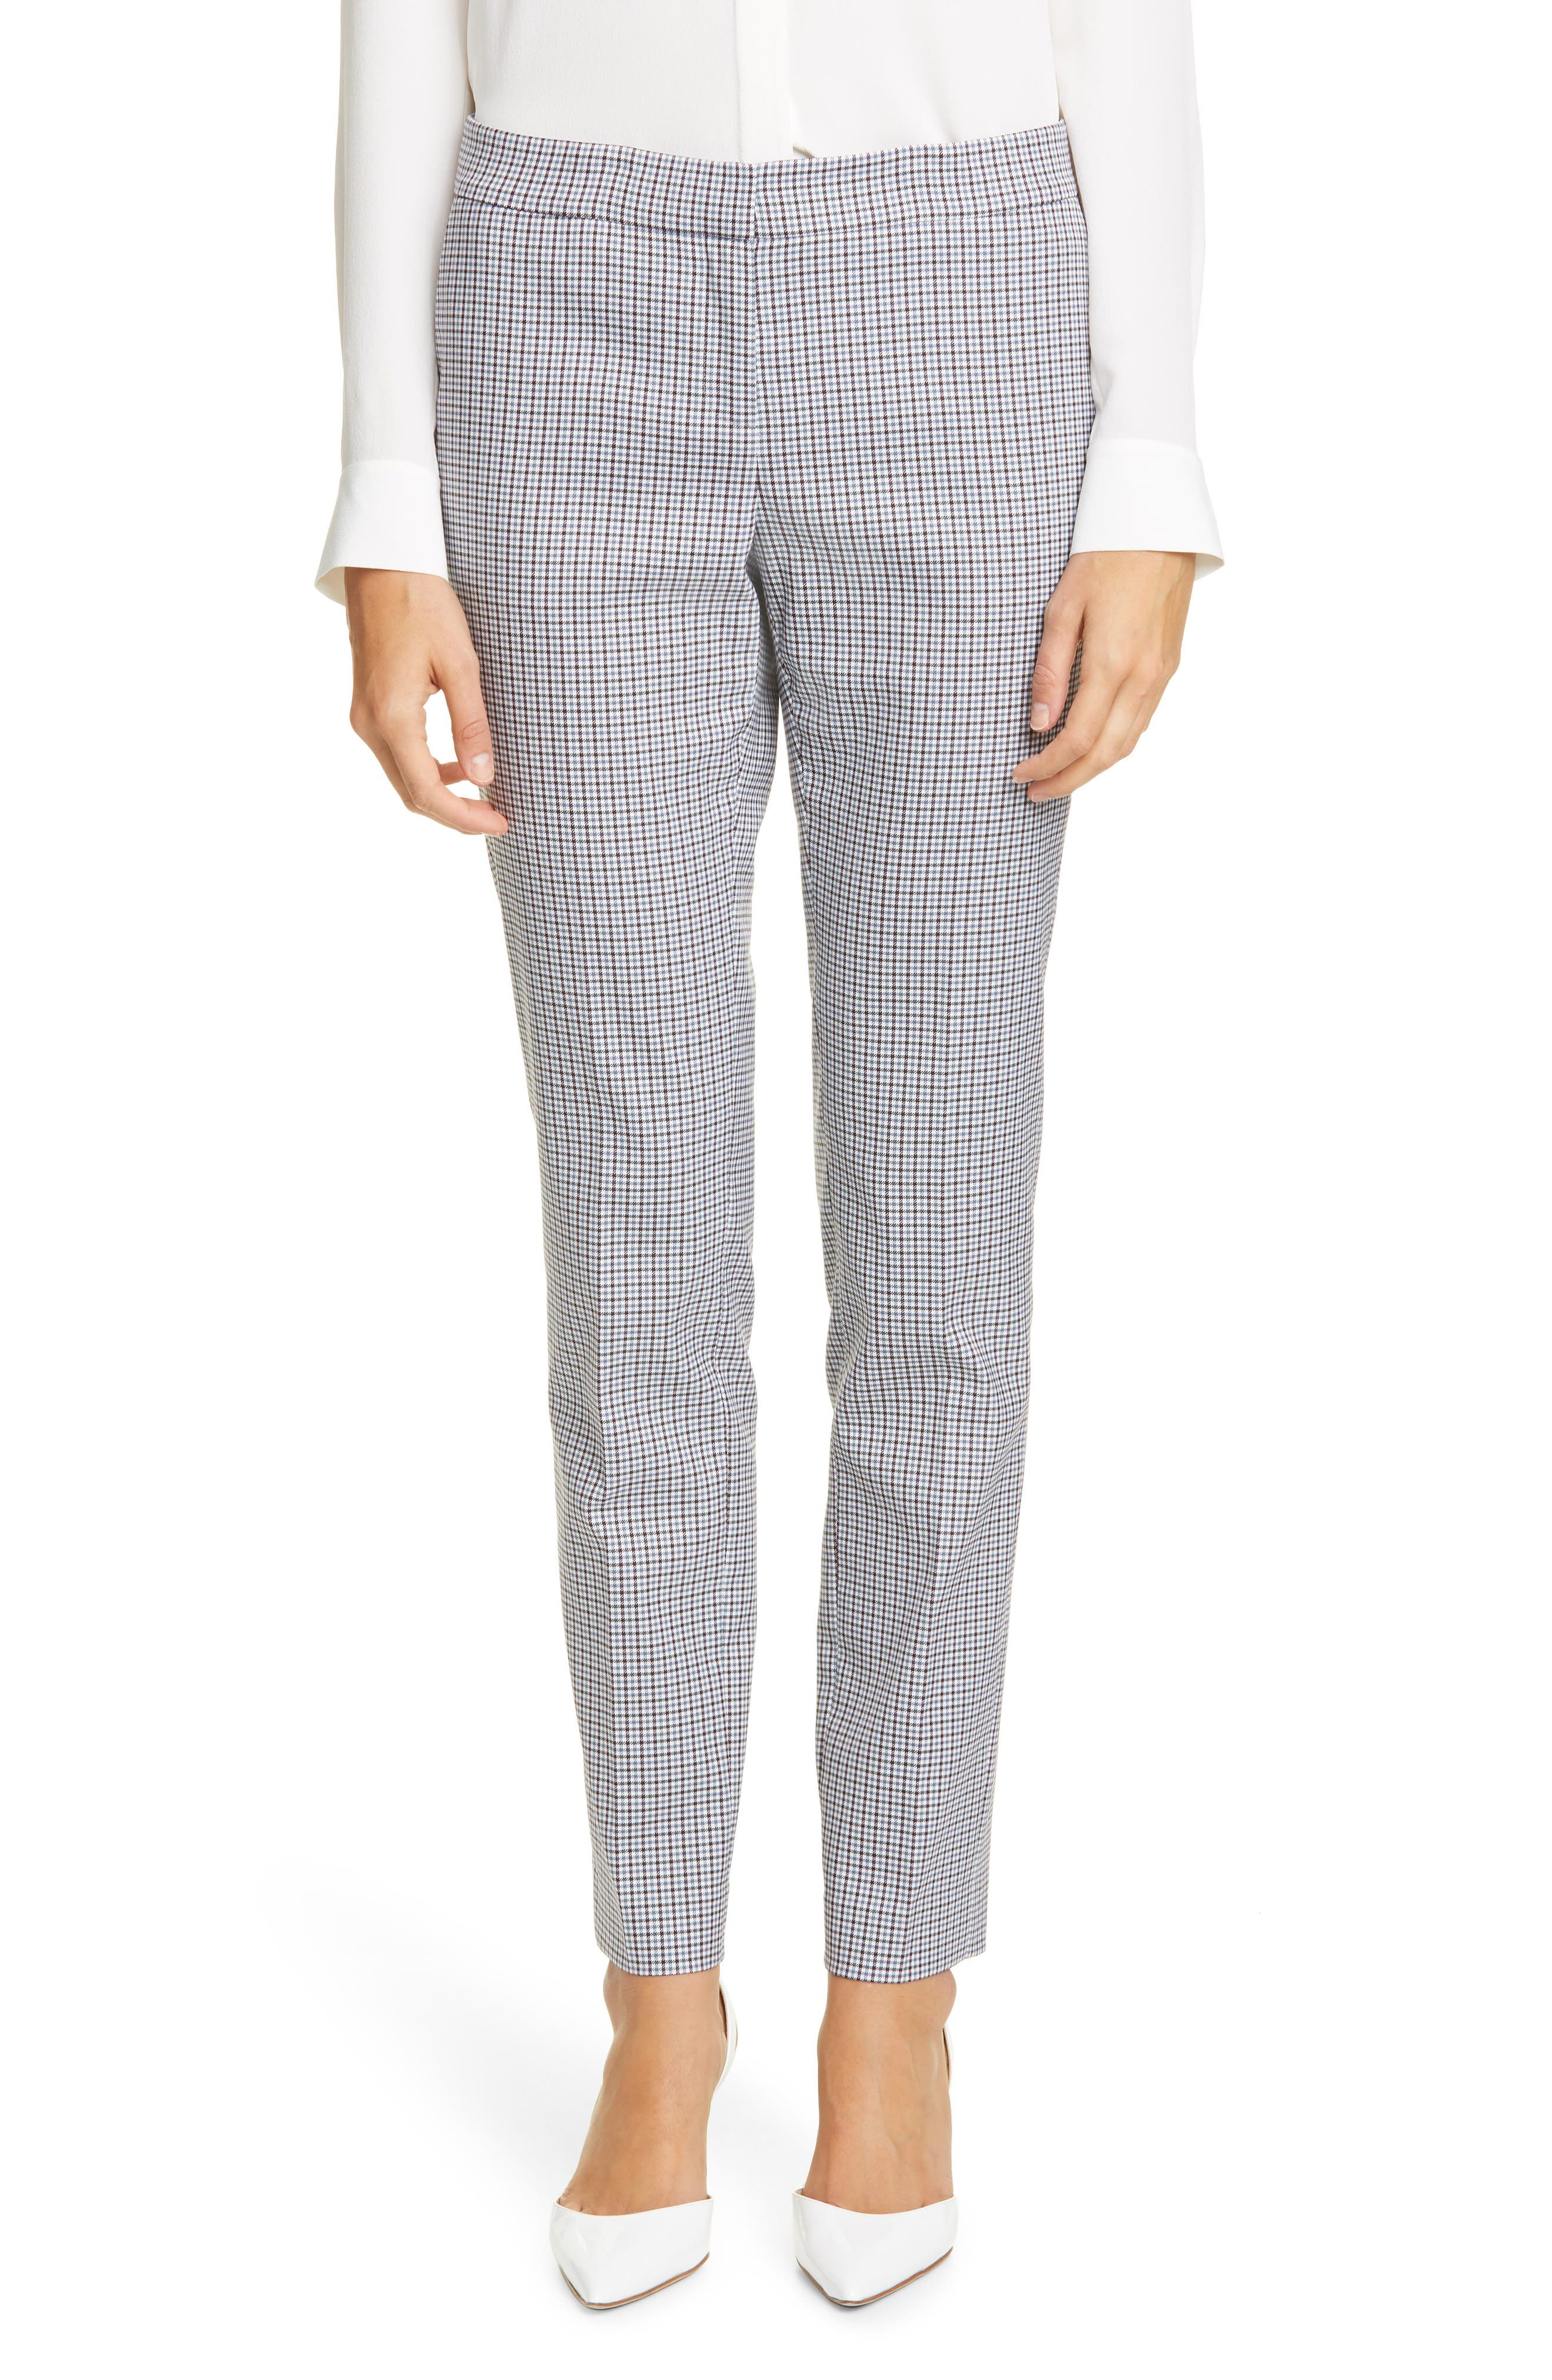 Image of Lafayette 148 New York Manhattan Slim Fit Pants